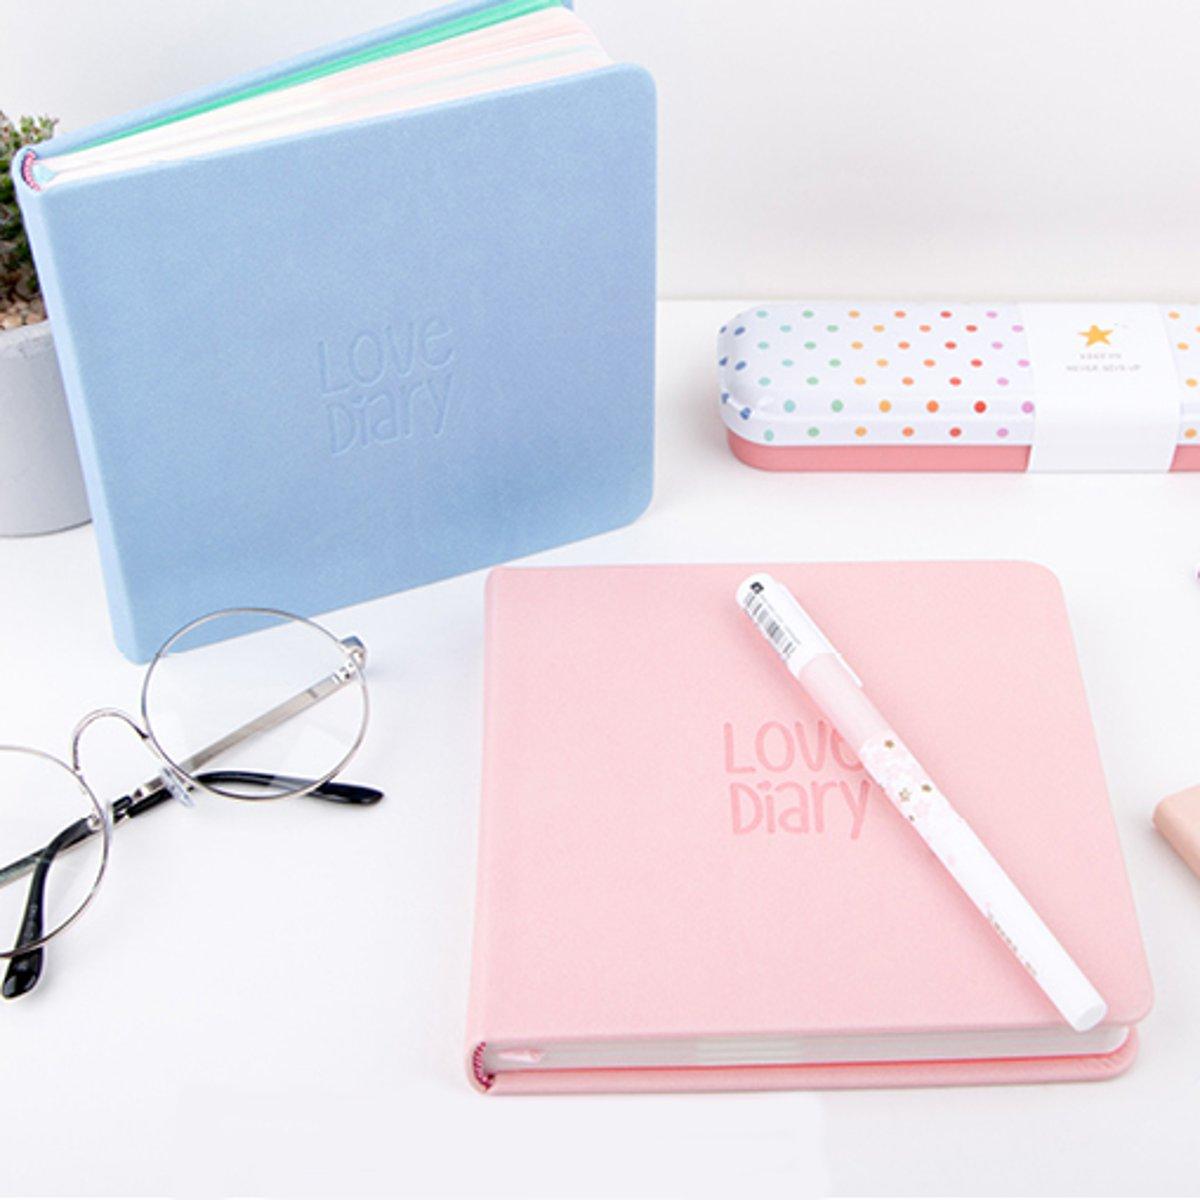 DIY Lover Notebook Cute Romantic Diary Planner Or